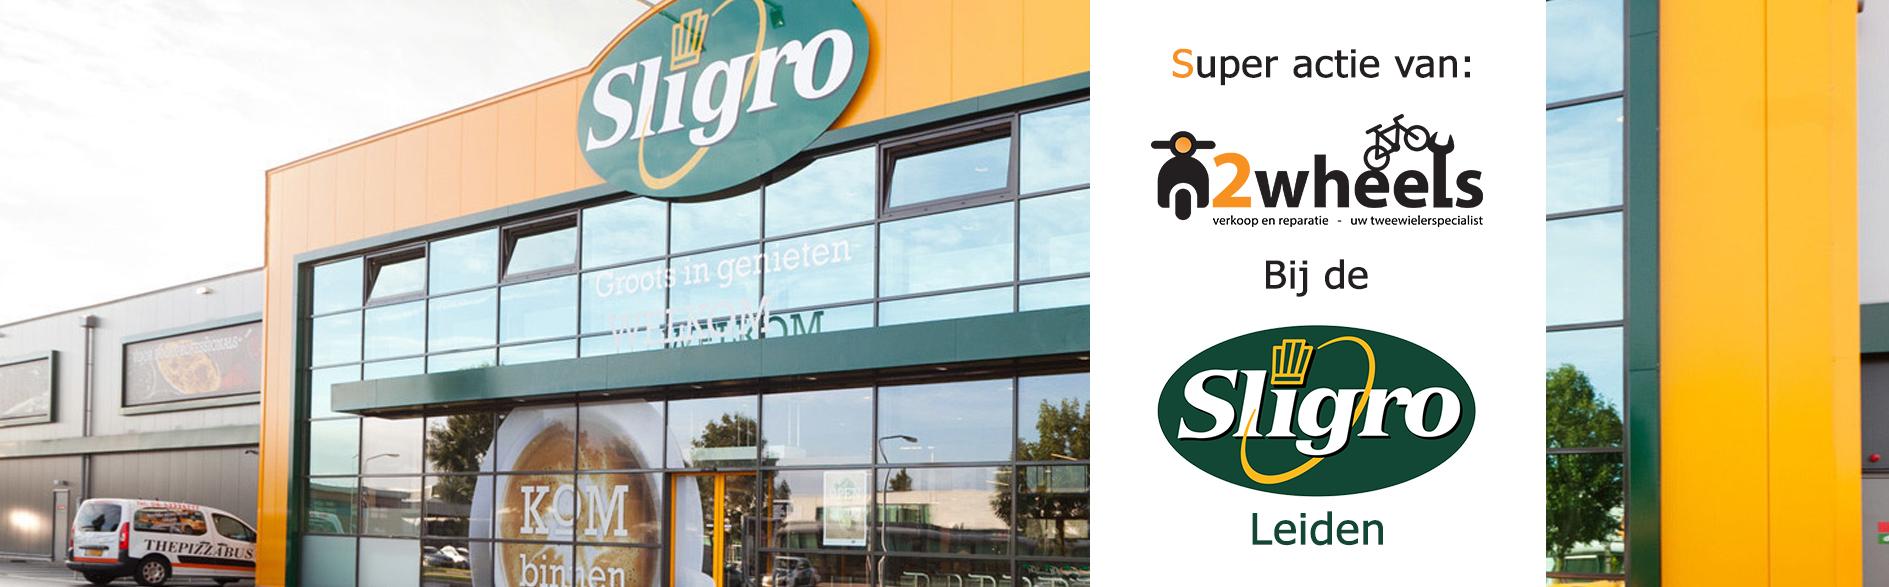 SYM E-XPRO bezorgscooter Sligro actie 2wheels